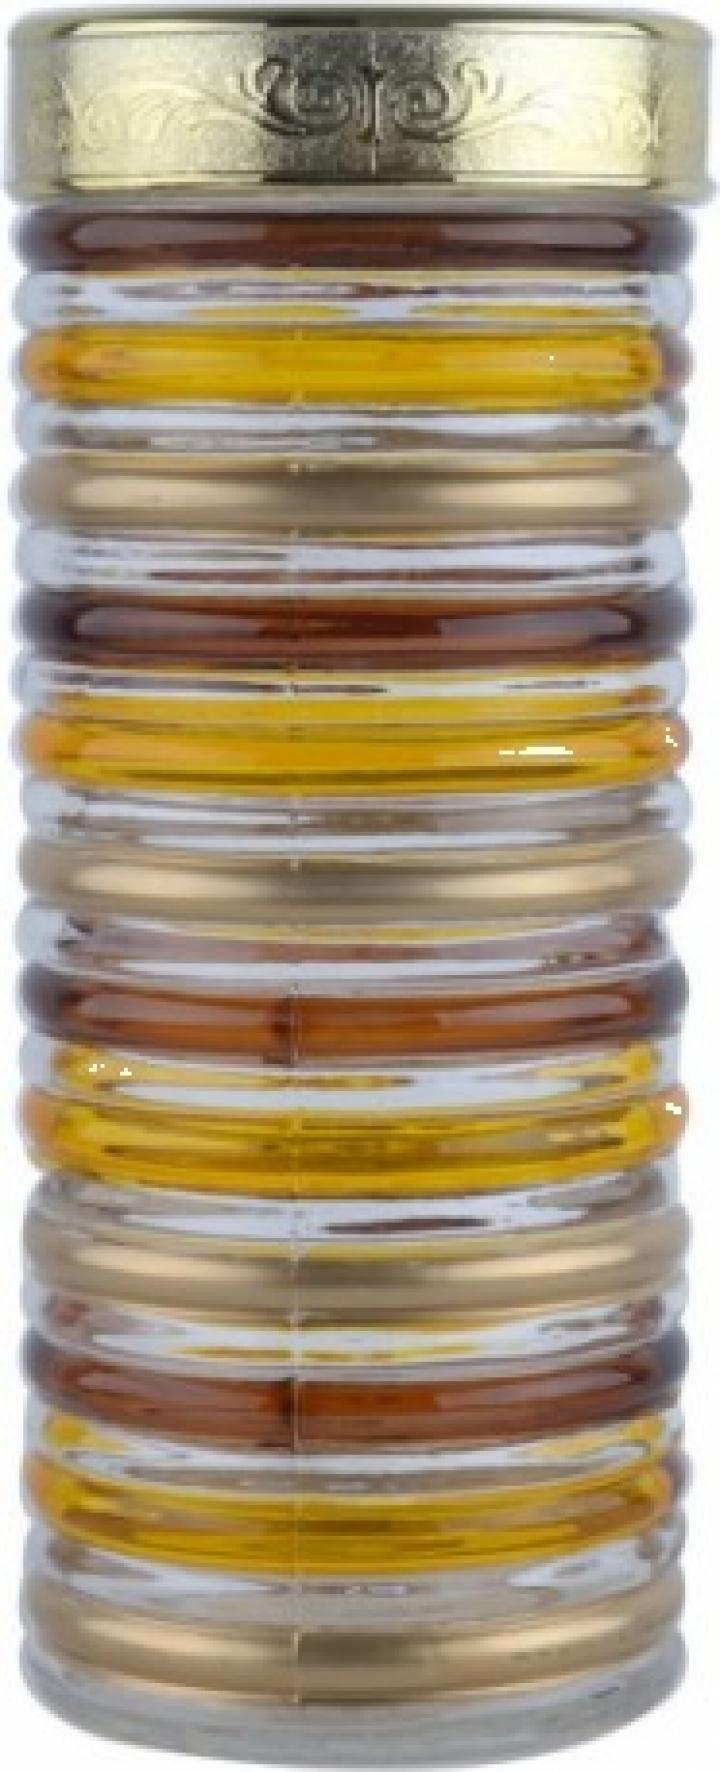 Borcan pictat manual din sticla, 2200 ml